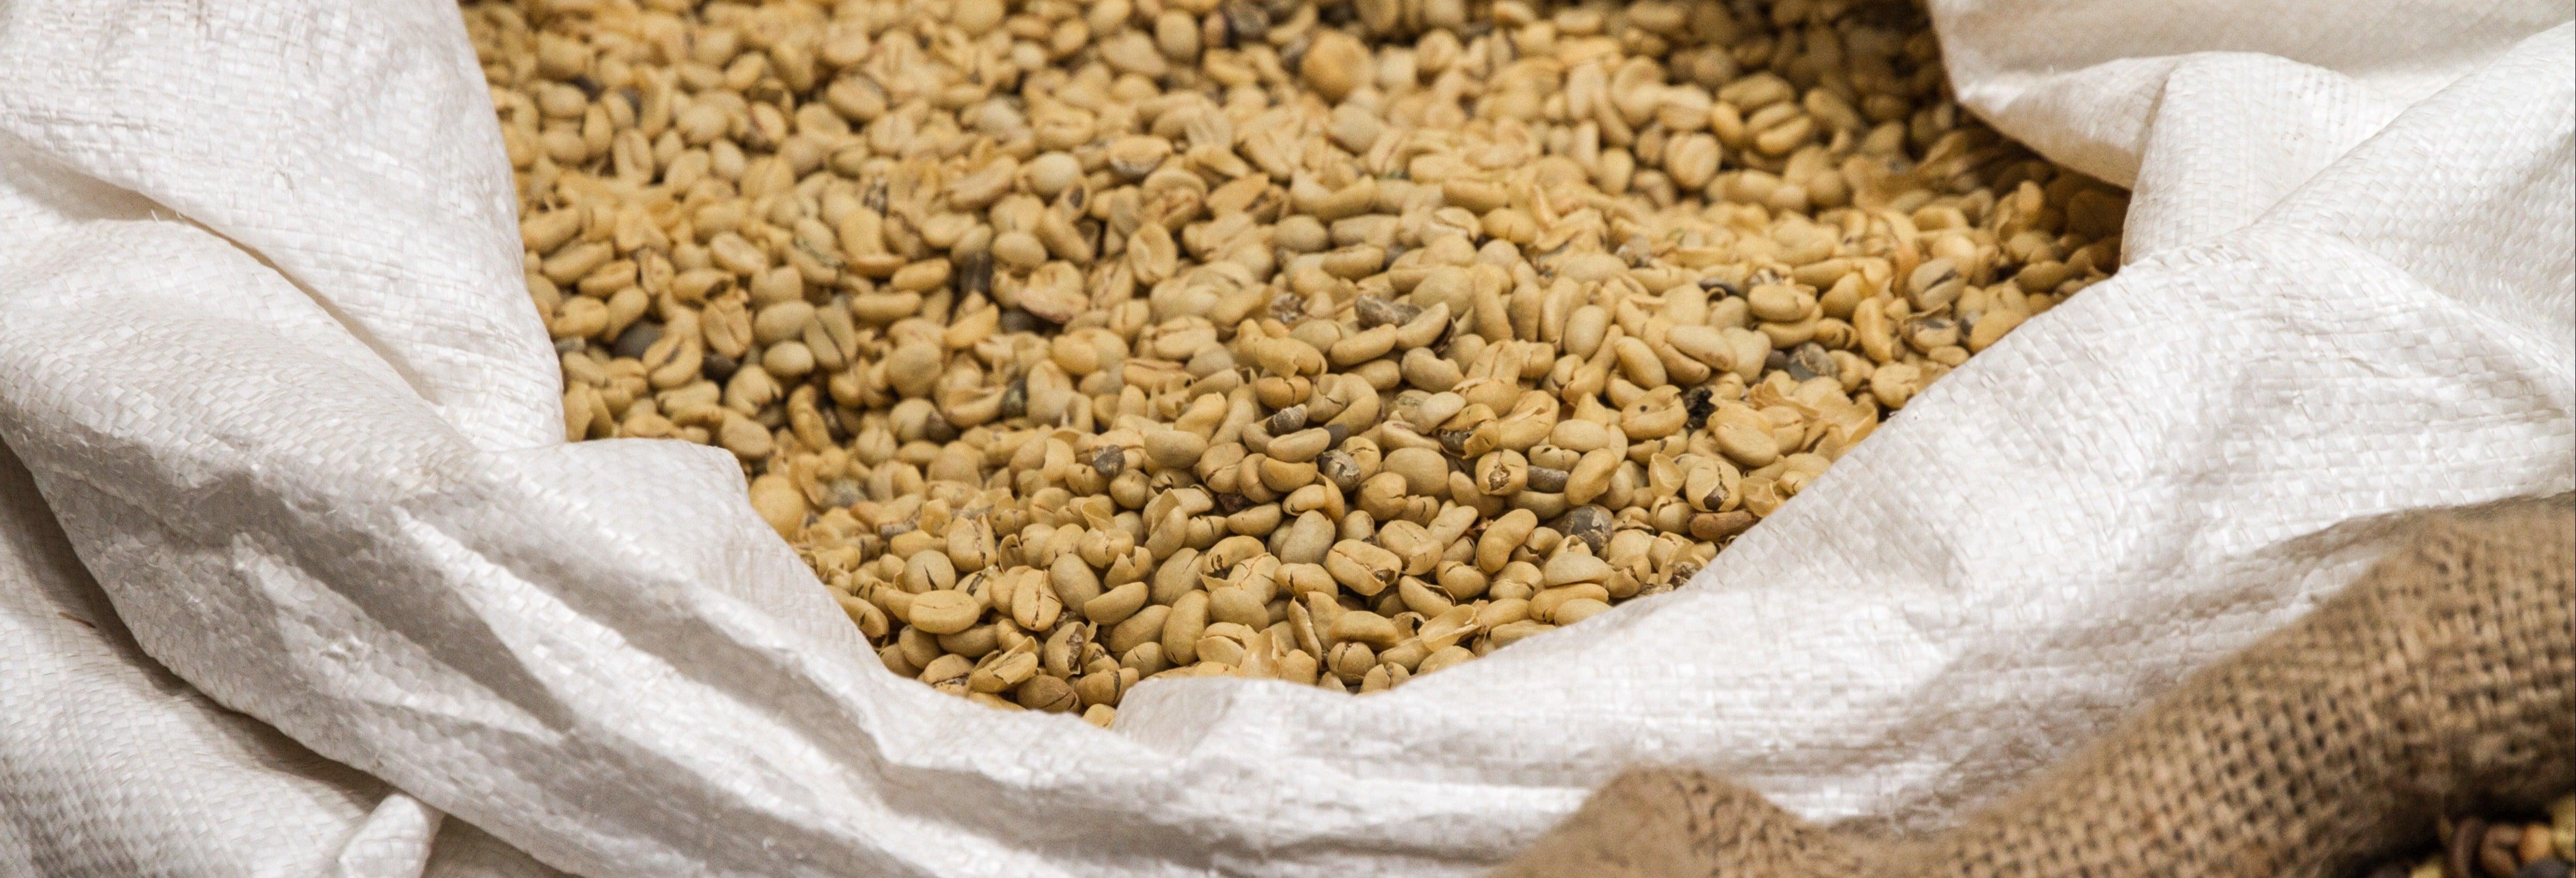 Doka Coffee Plantation, Grecia & Sarchí Tour